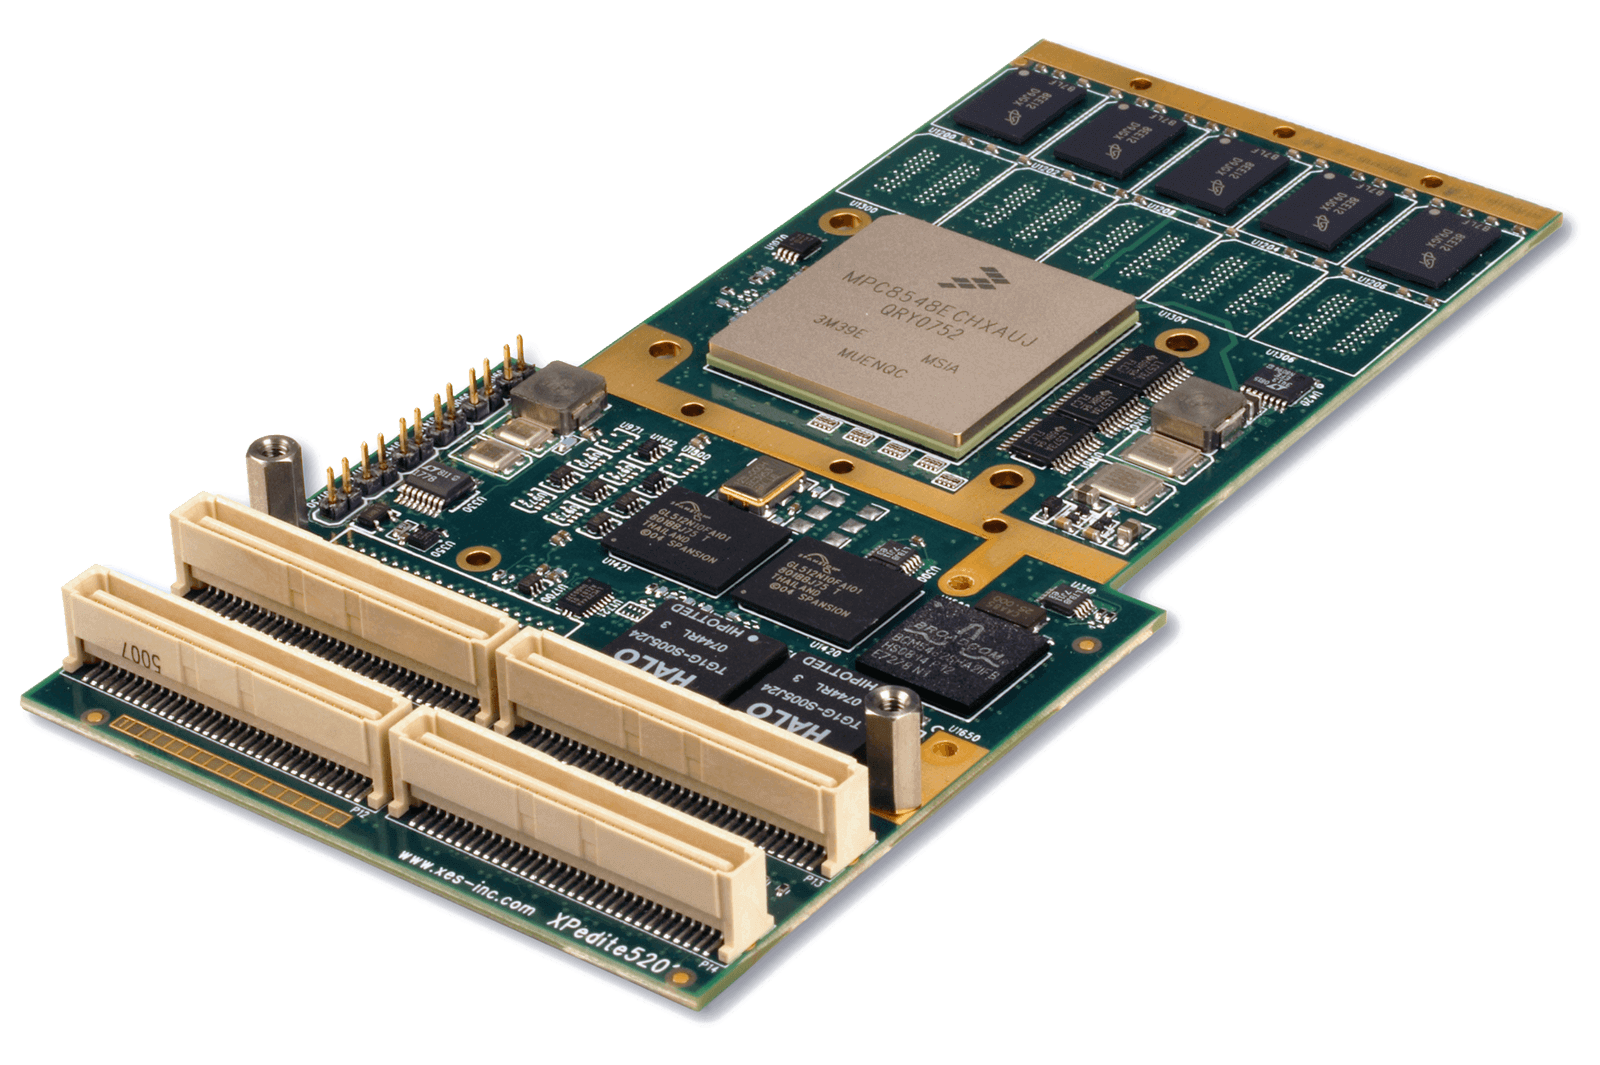 Nxp Qoriq Power Architecture Rugged Sbc Designs Extreme 64 Bit Computer On Module Xpedite5201